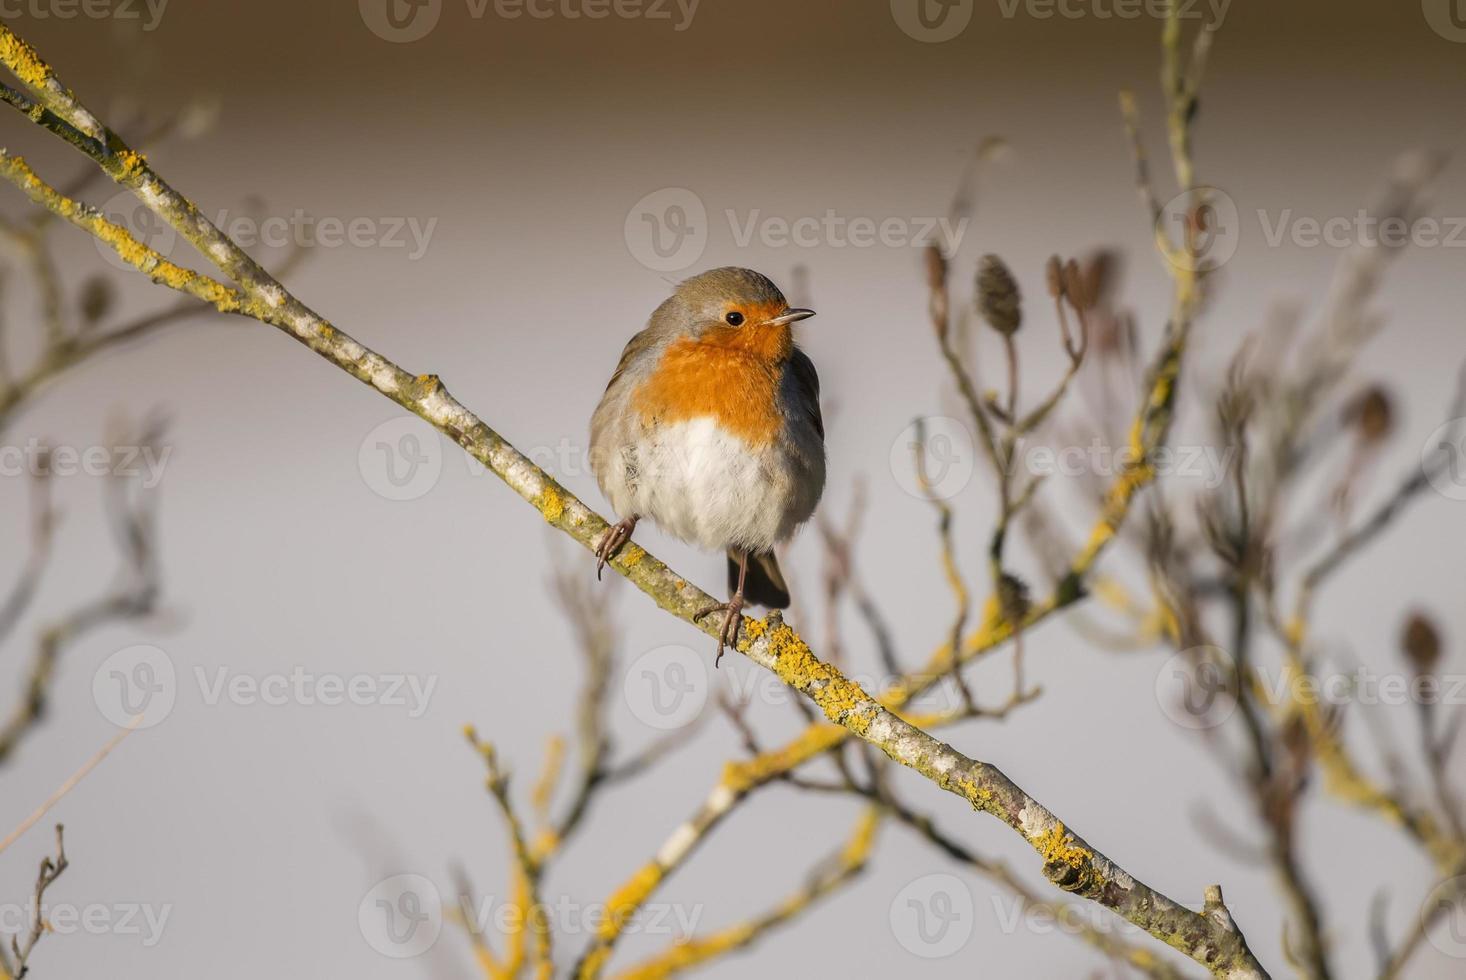 Robin, redbreast, Erithacus rubecula, perched on a twig photo